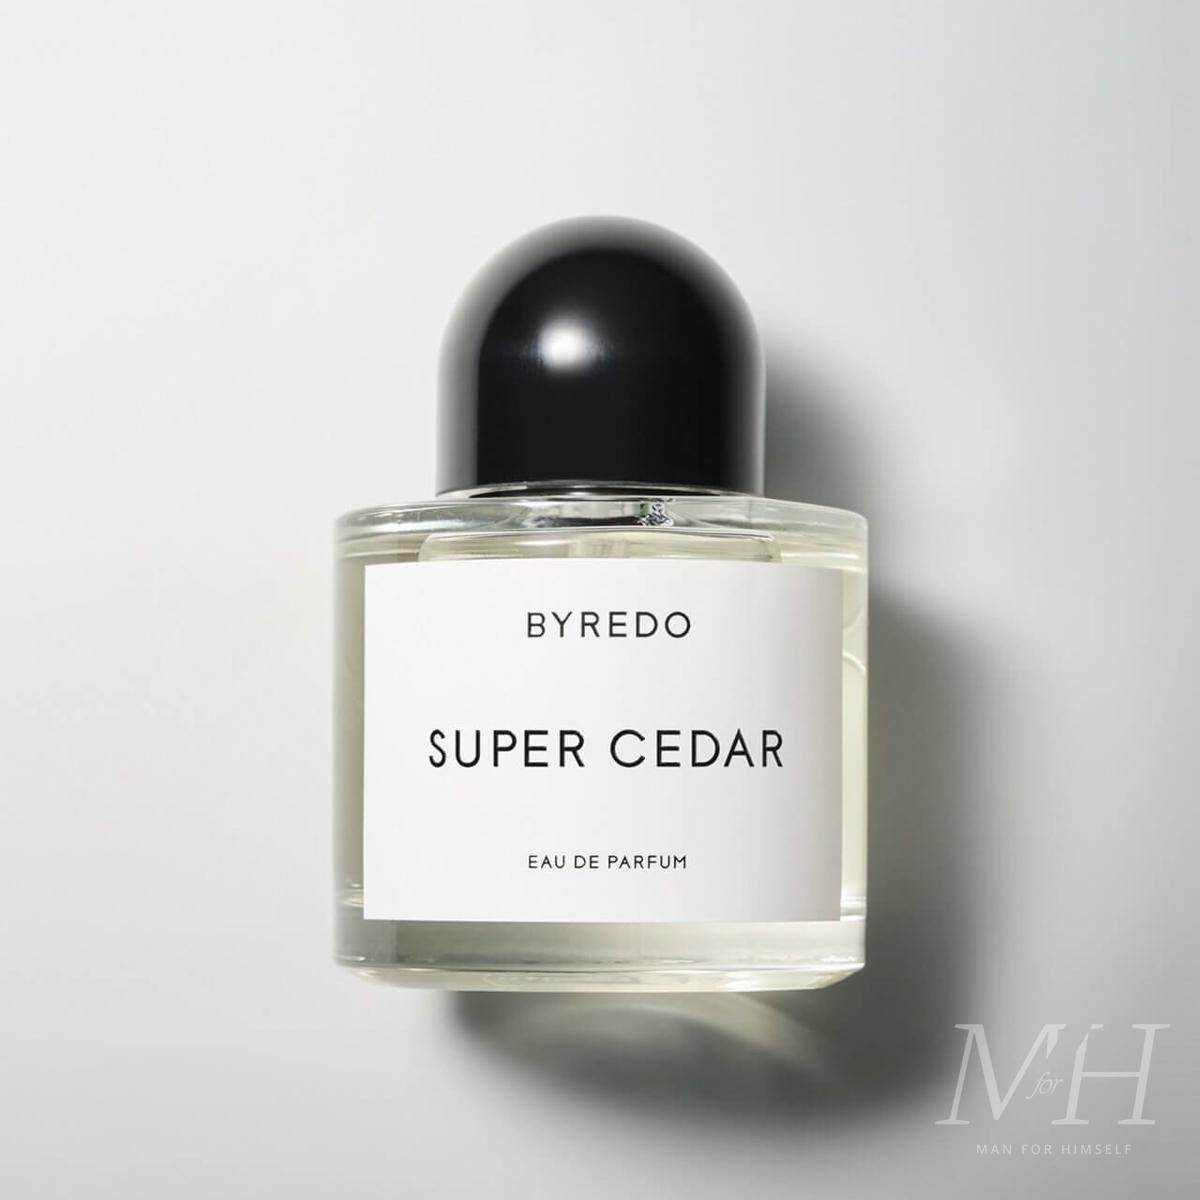 byredo-supercedar-fragrance-man-for-himself